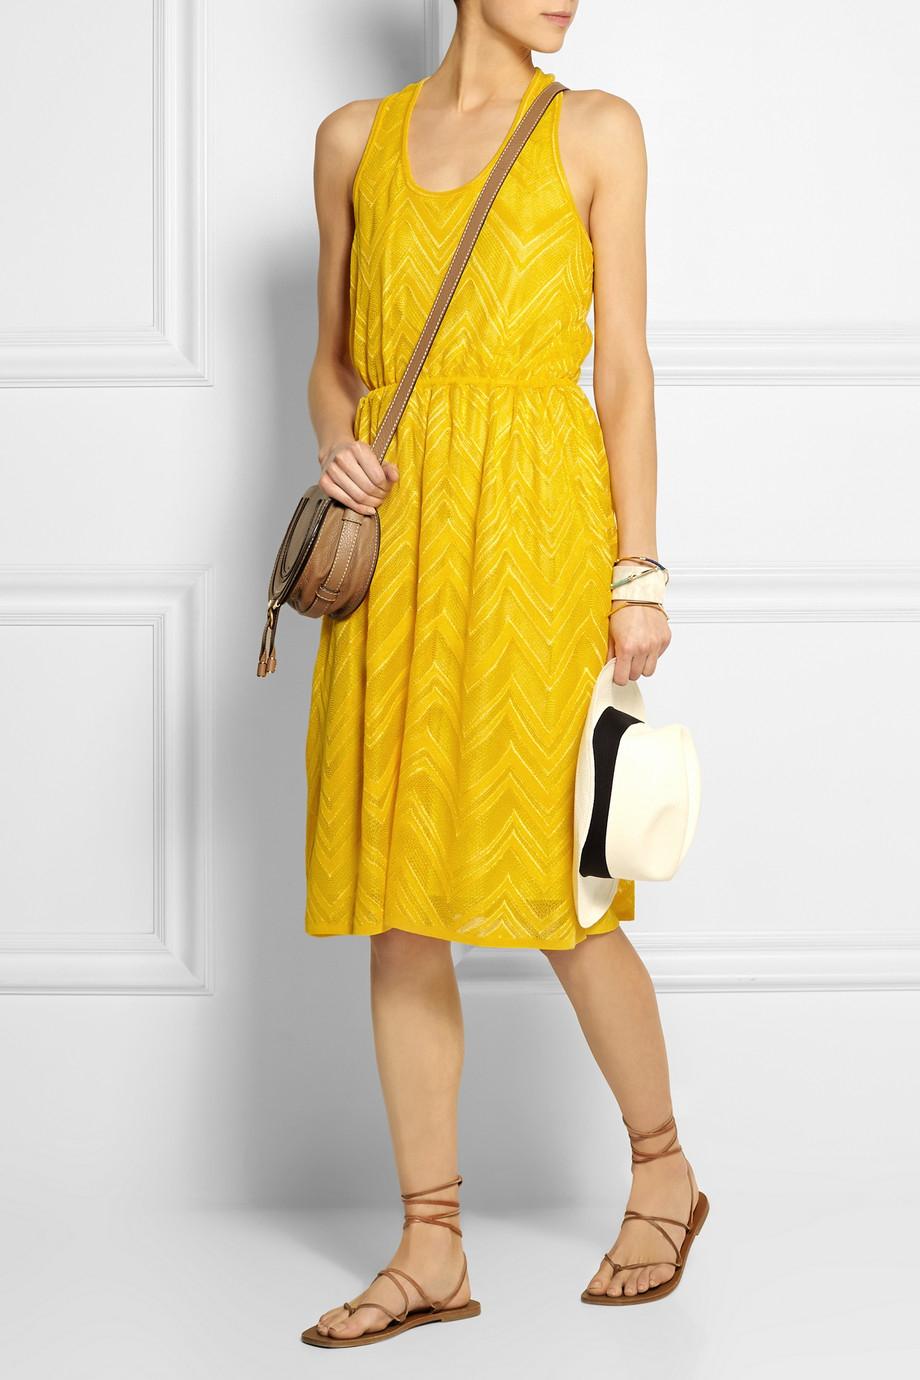 M missoni yellow dress